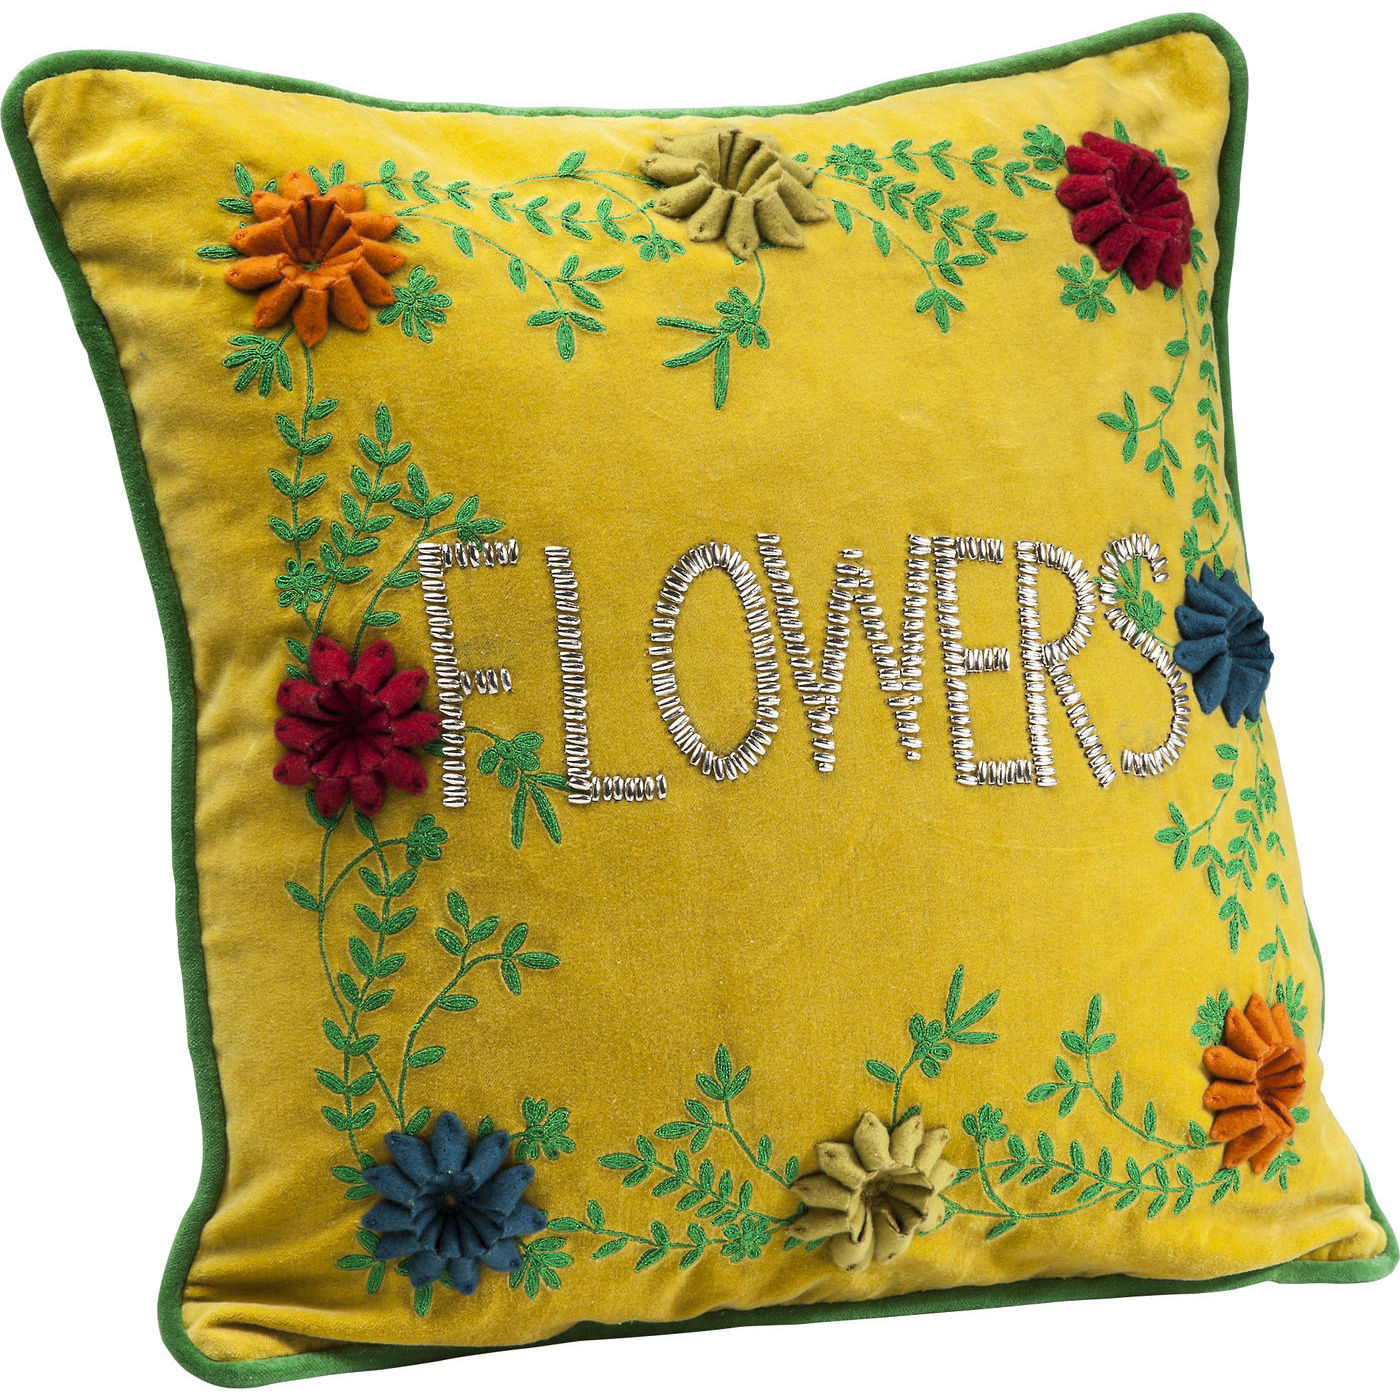 kissen flowers yellow 45x45cm kare design mutoni m bel. Black Bedroom Furniture Sets. Home Design Ideas